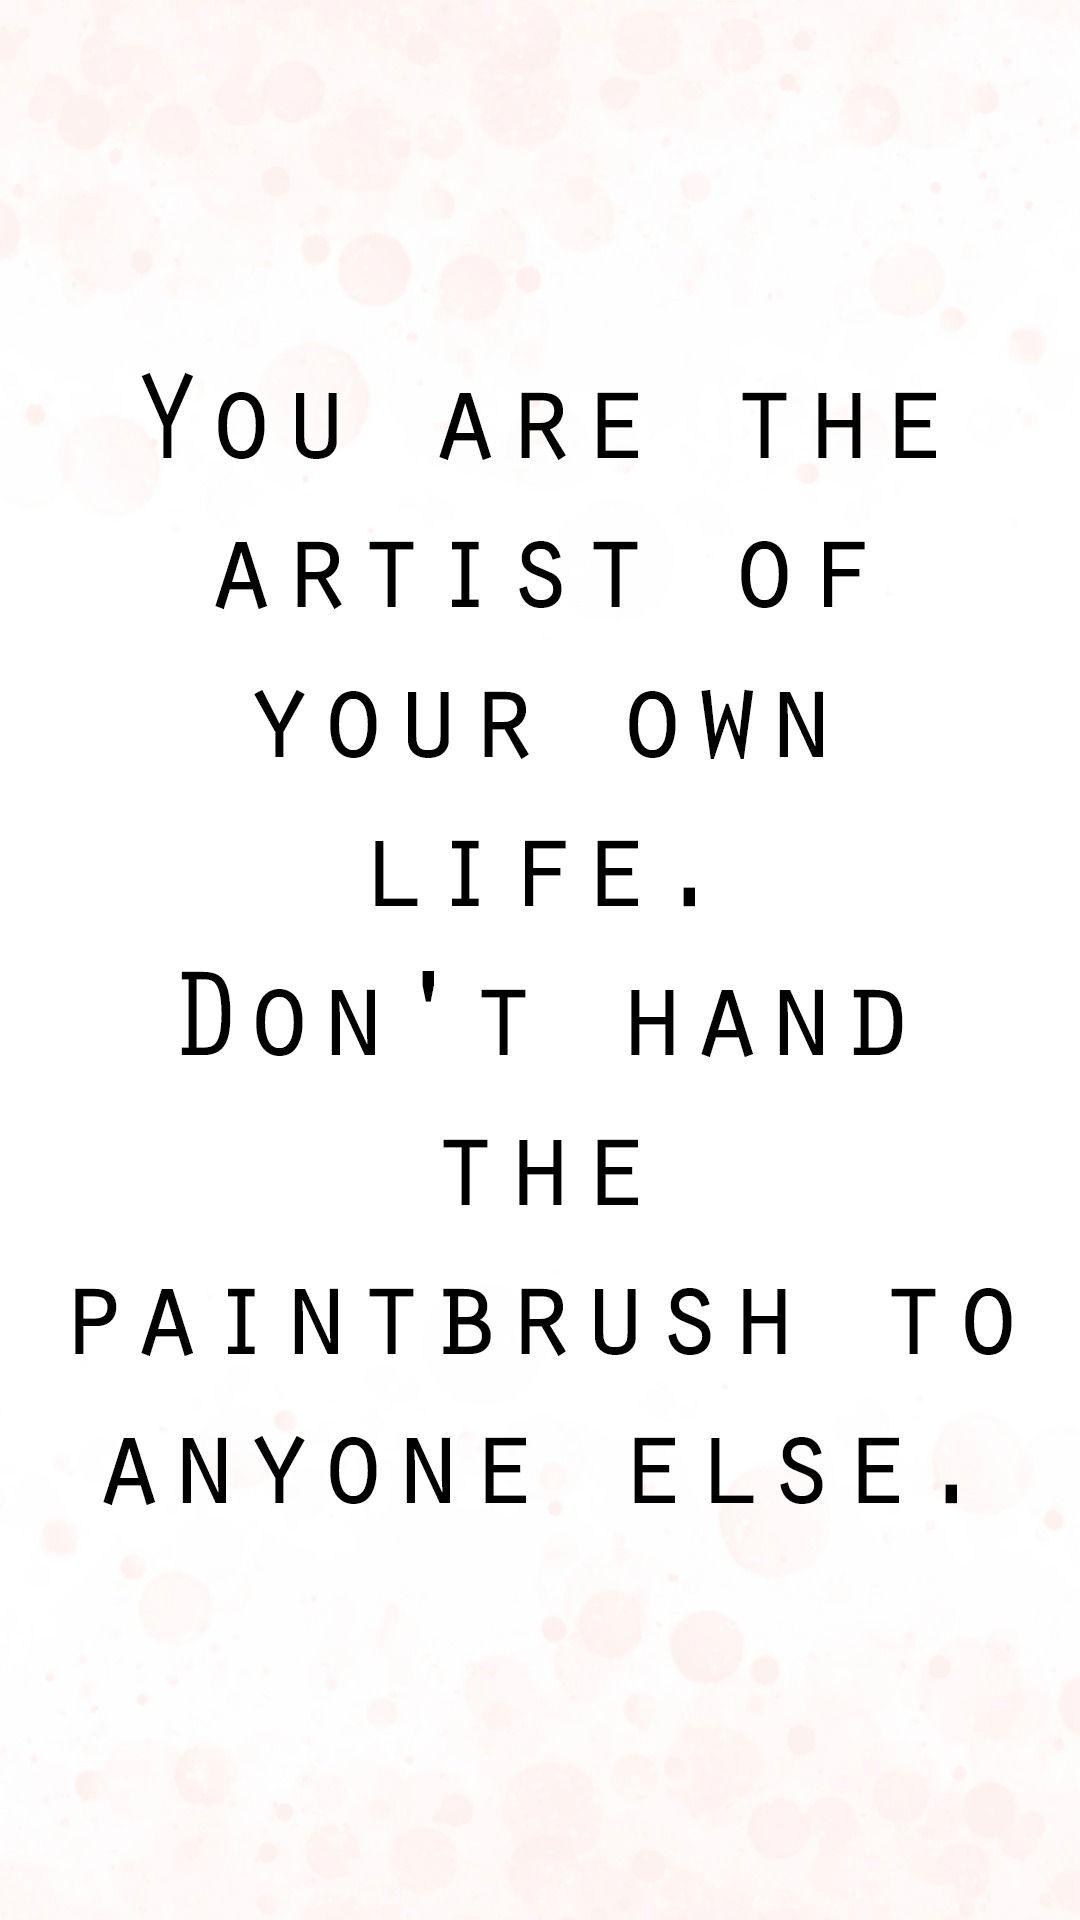 Motivational Quotes motivational quotes wallpaper